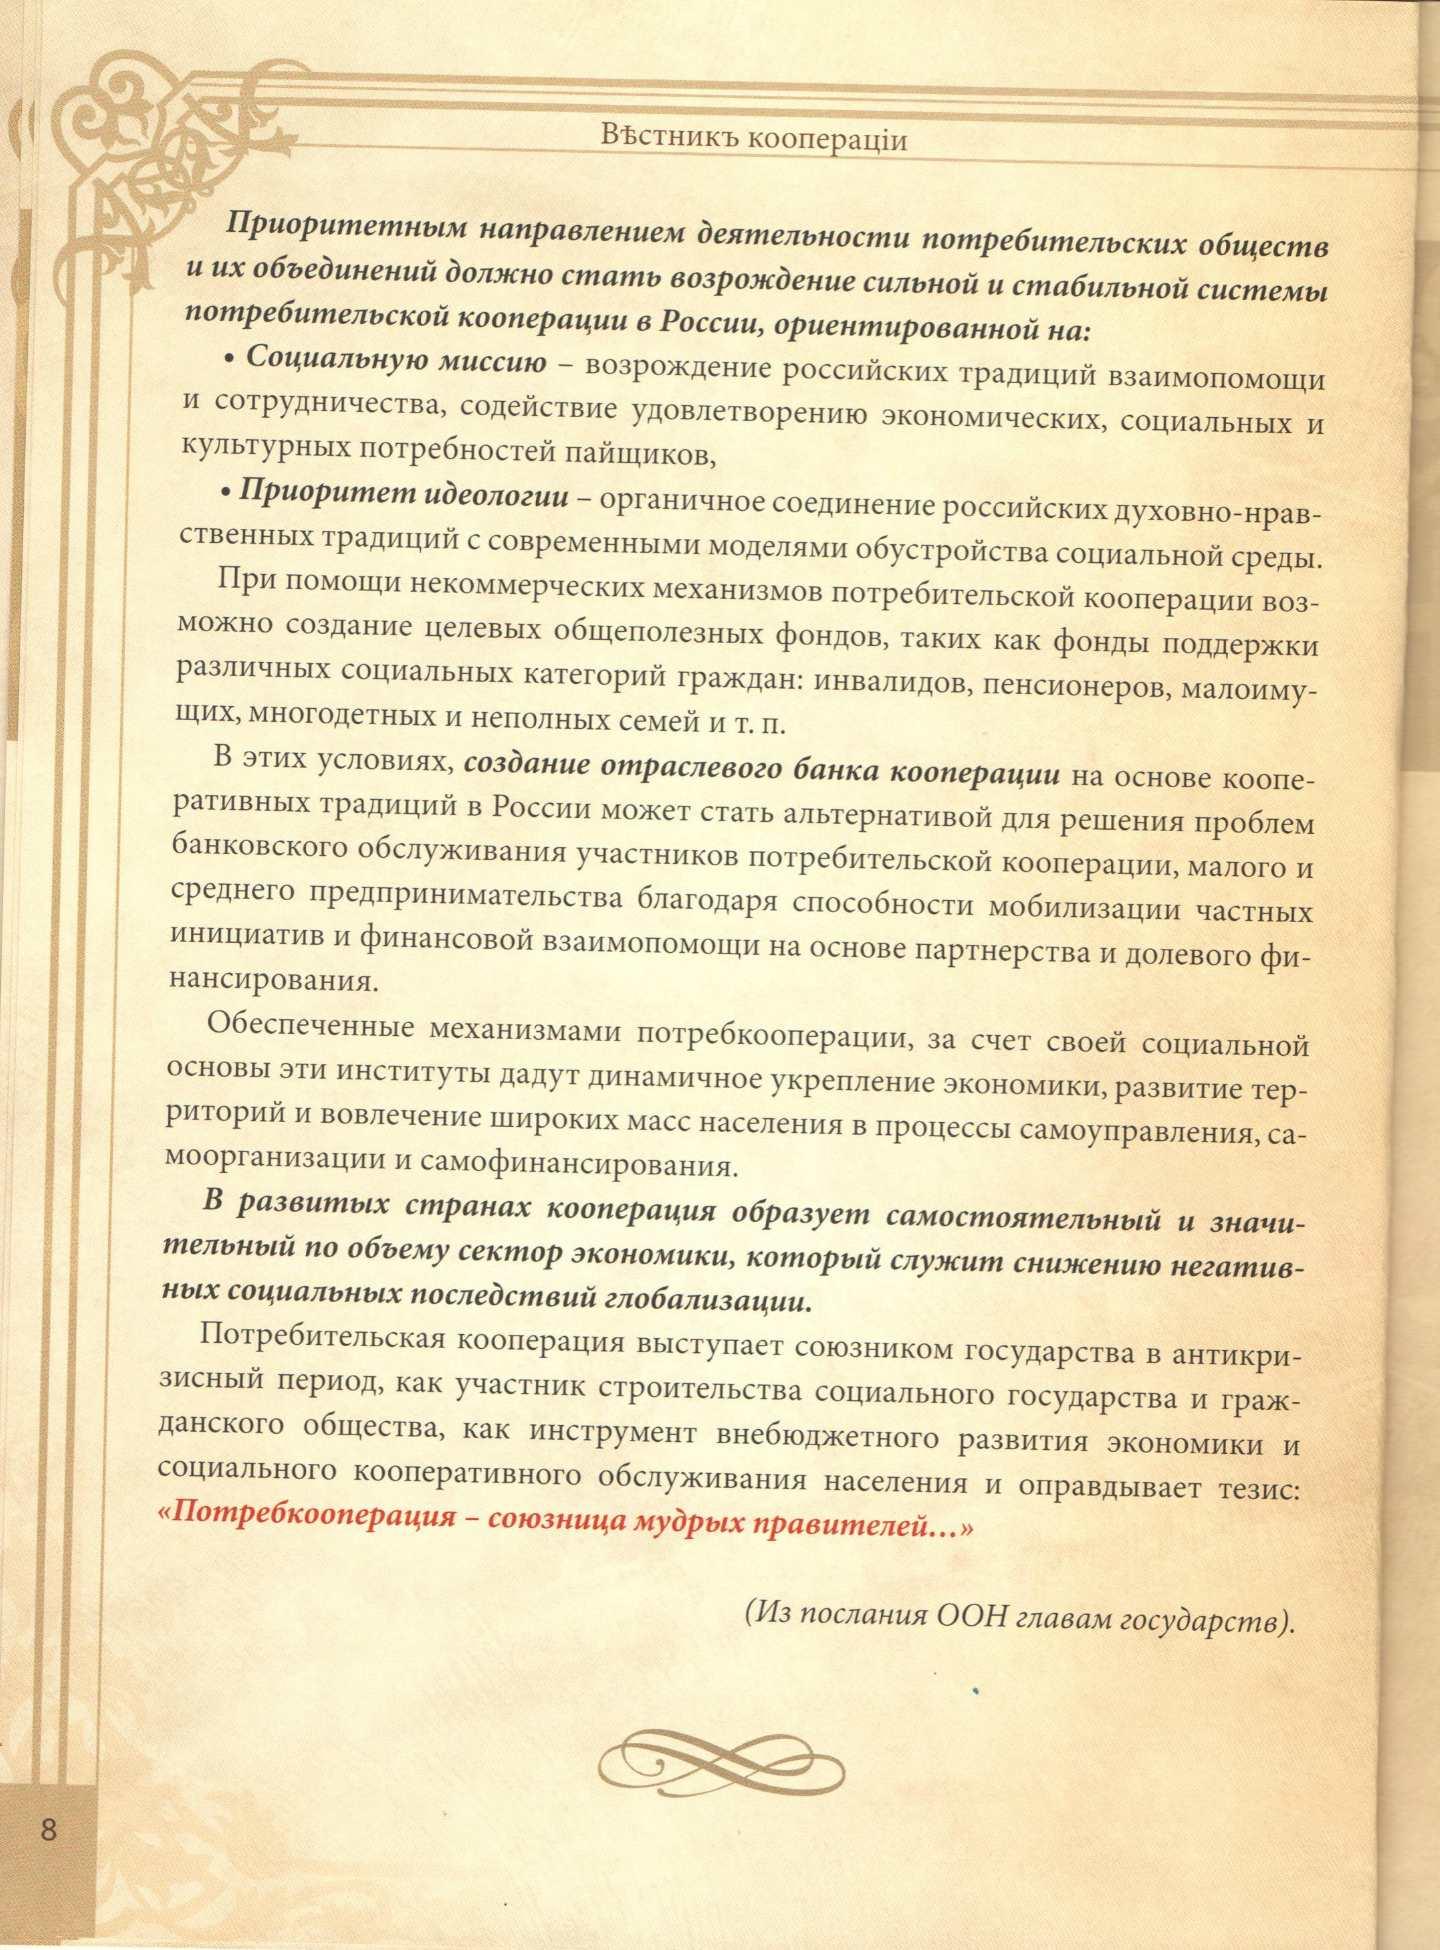 Вестник кооперации-8